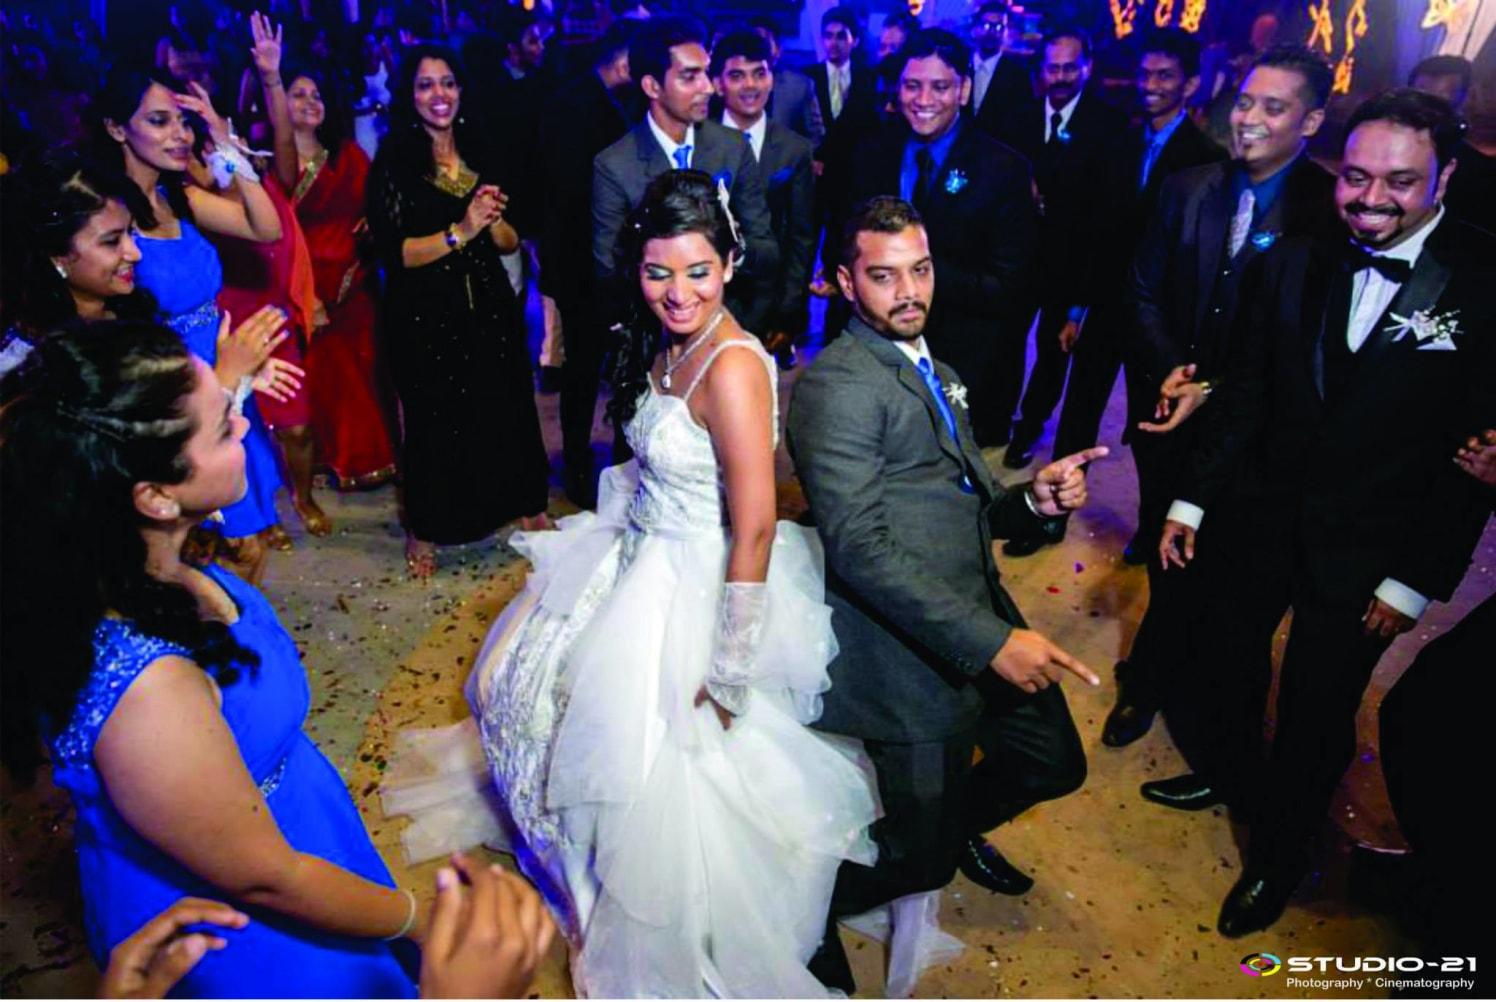 Candid Shot Of Bridegroom Swaying On The Dancefloor by Terence Savio Pimenta Wedding-photography | Weddings Photos & Ideas